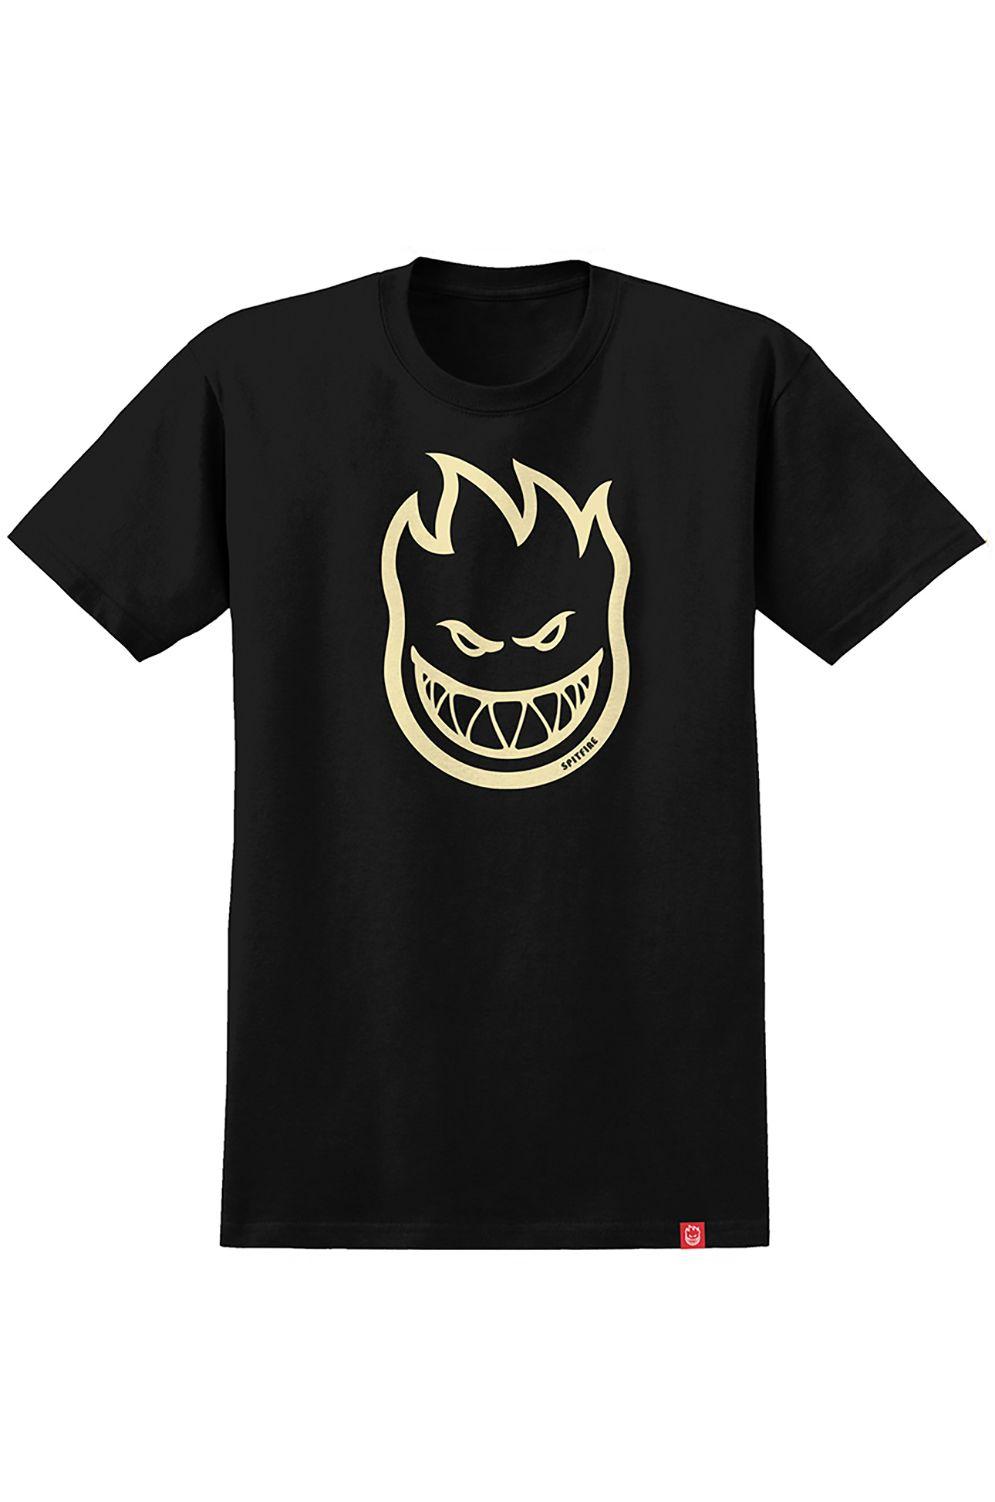 Spitfire T-Shirt BIGHEAD Black W/ Raw Discharge